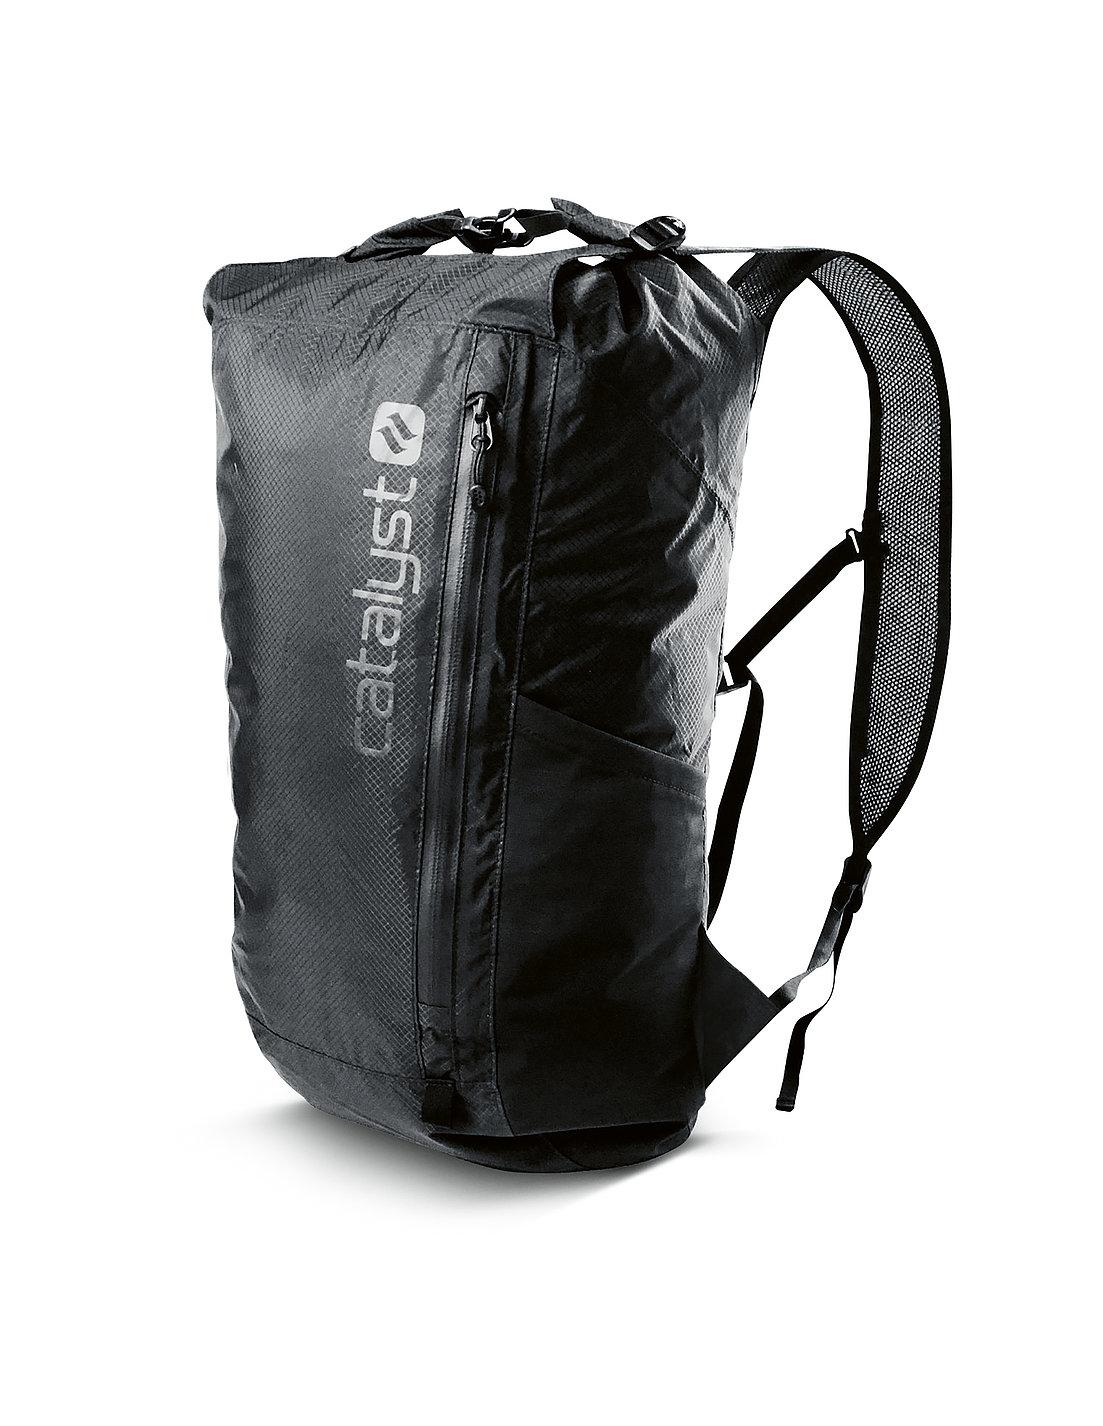 Catalyst Waterproof 20L Backpack | Red Dot Design Award